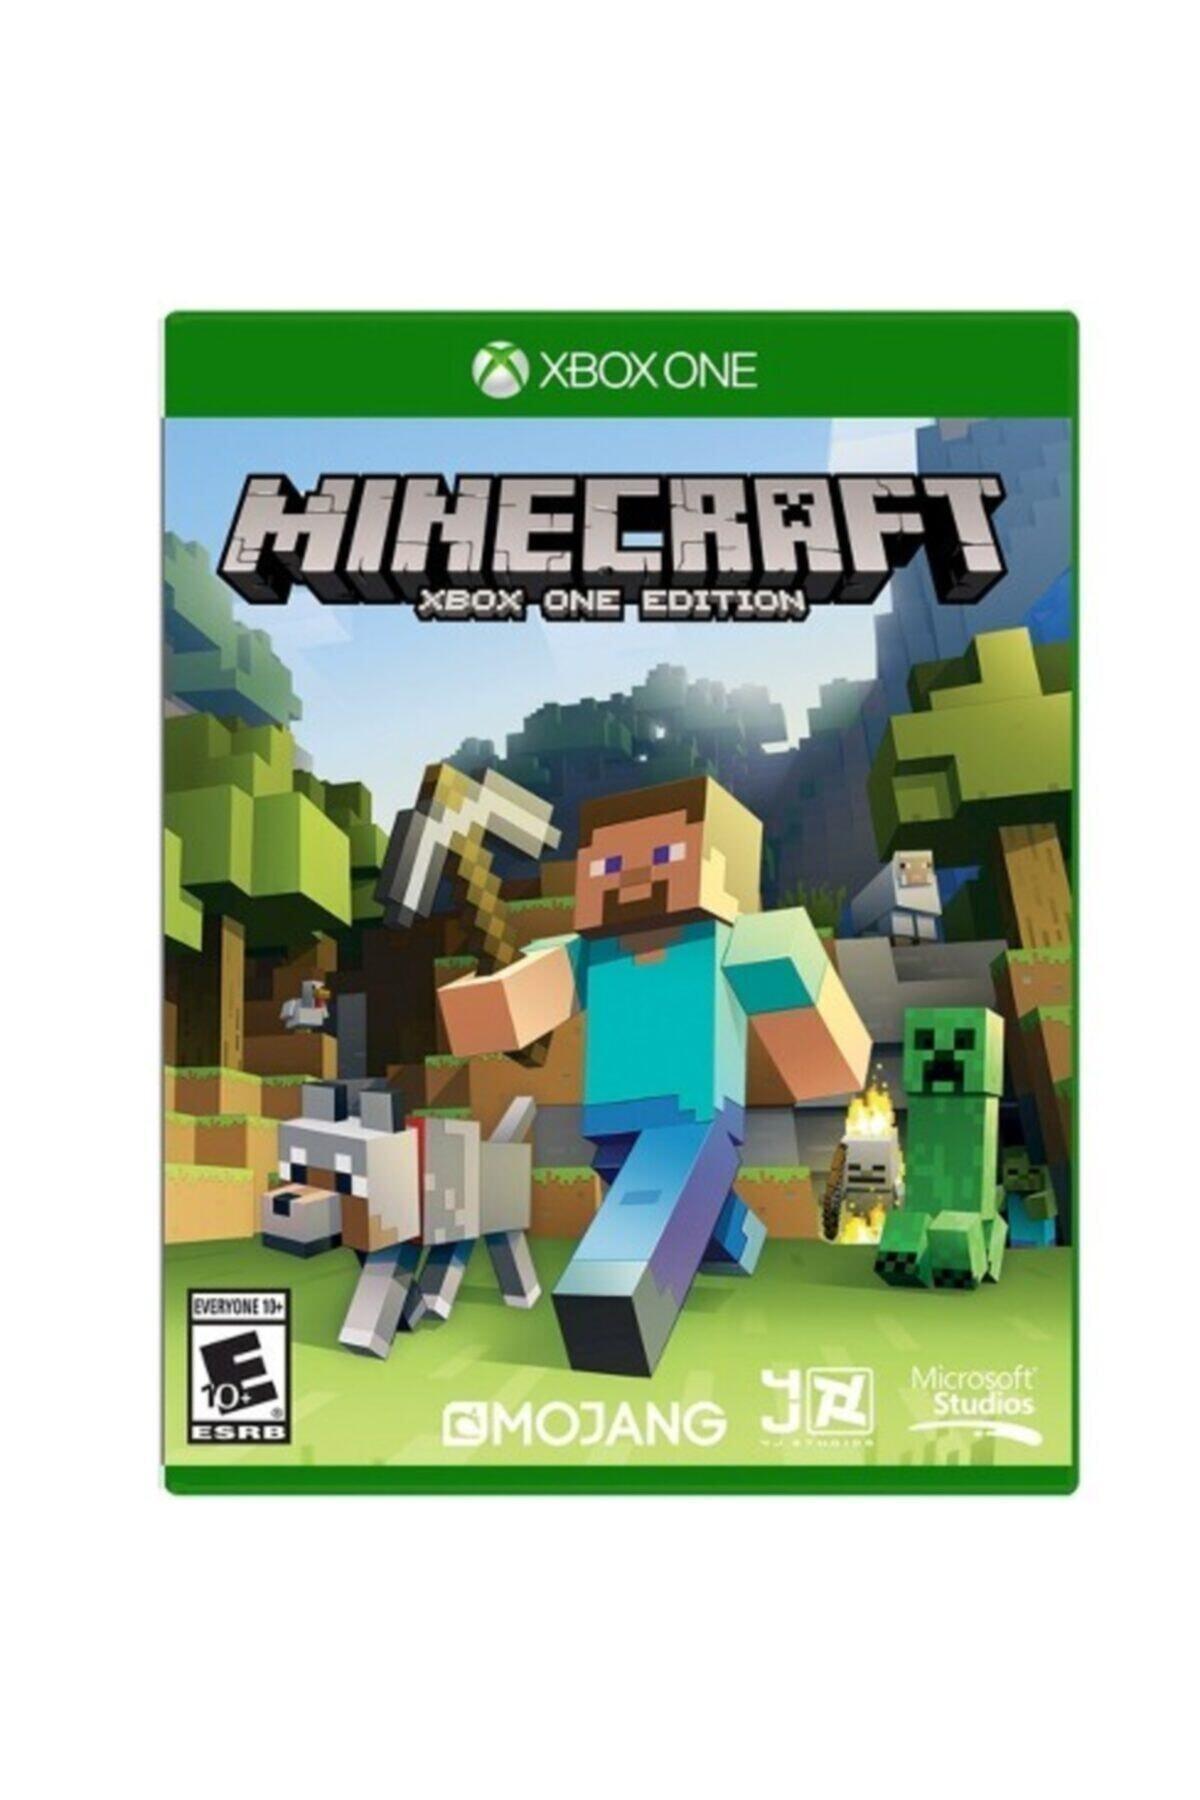 Microsoft Studios Minecraft Xbox One Oyun 1